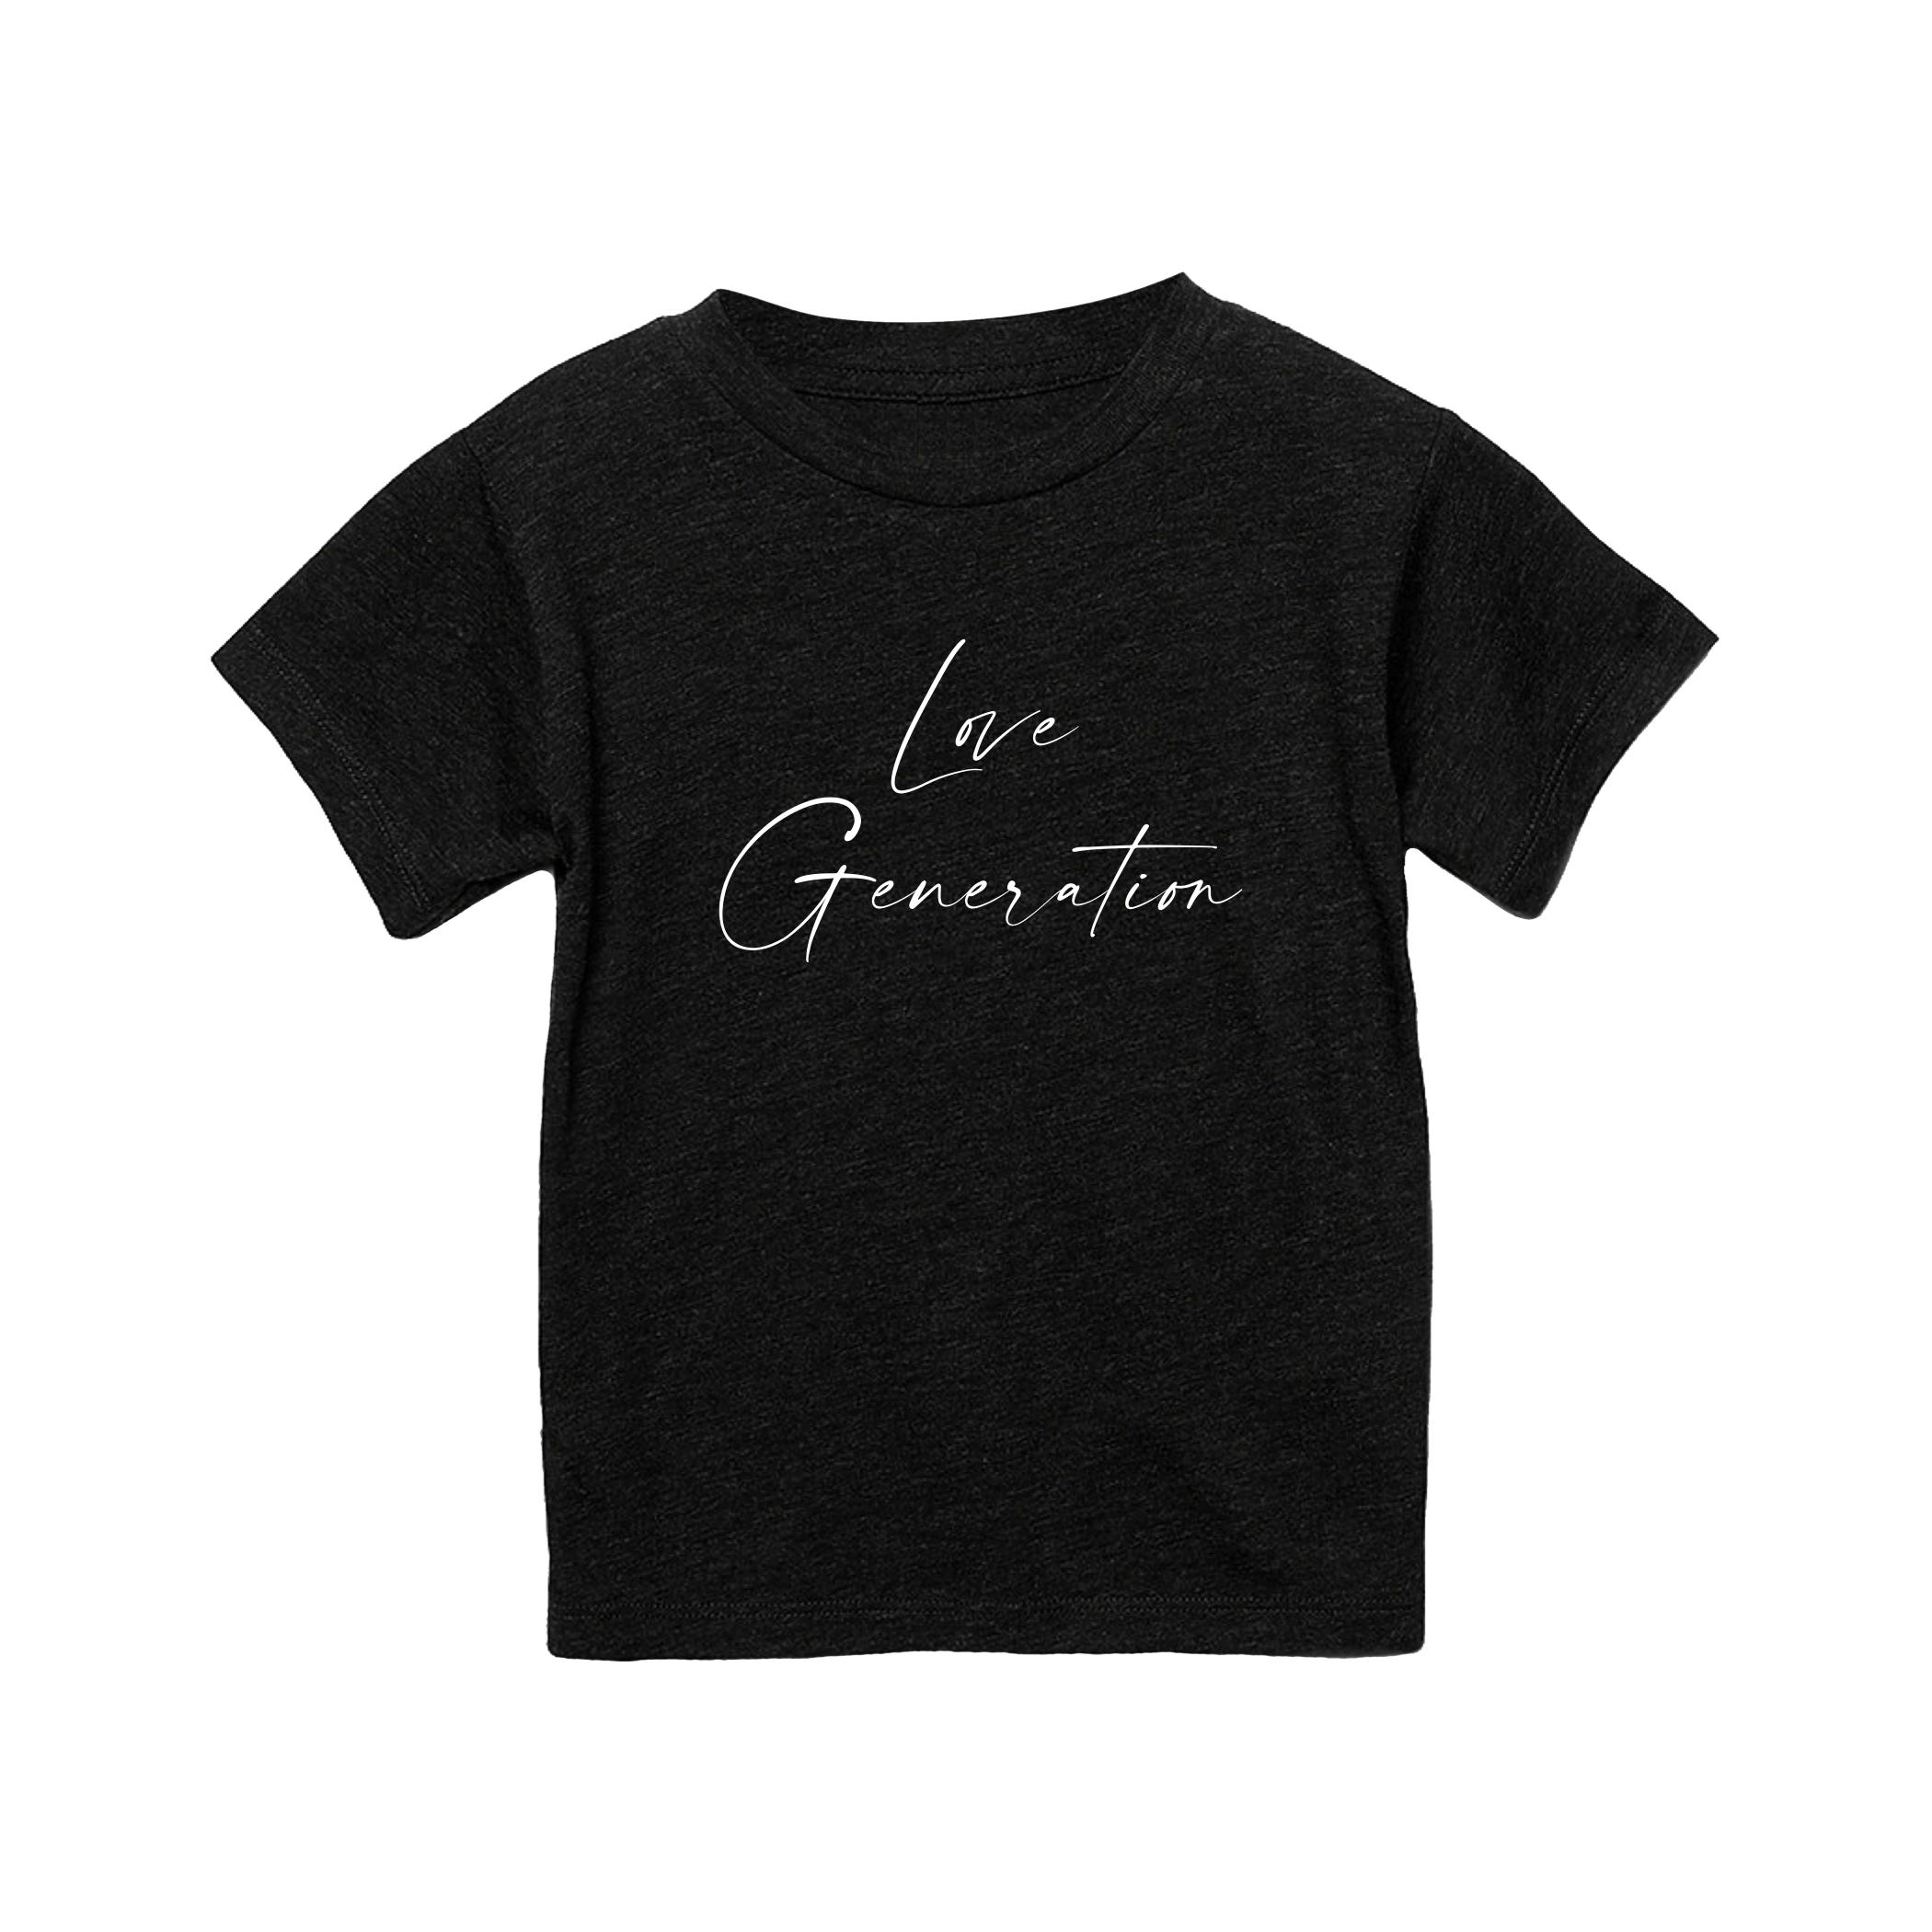 Love Generation Tee | Trada Marketplace